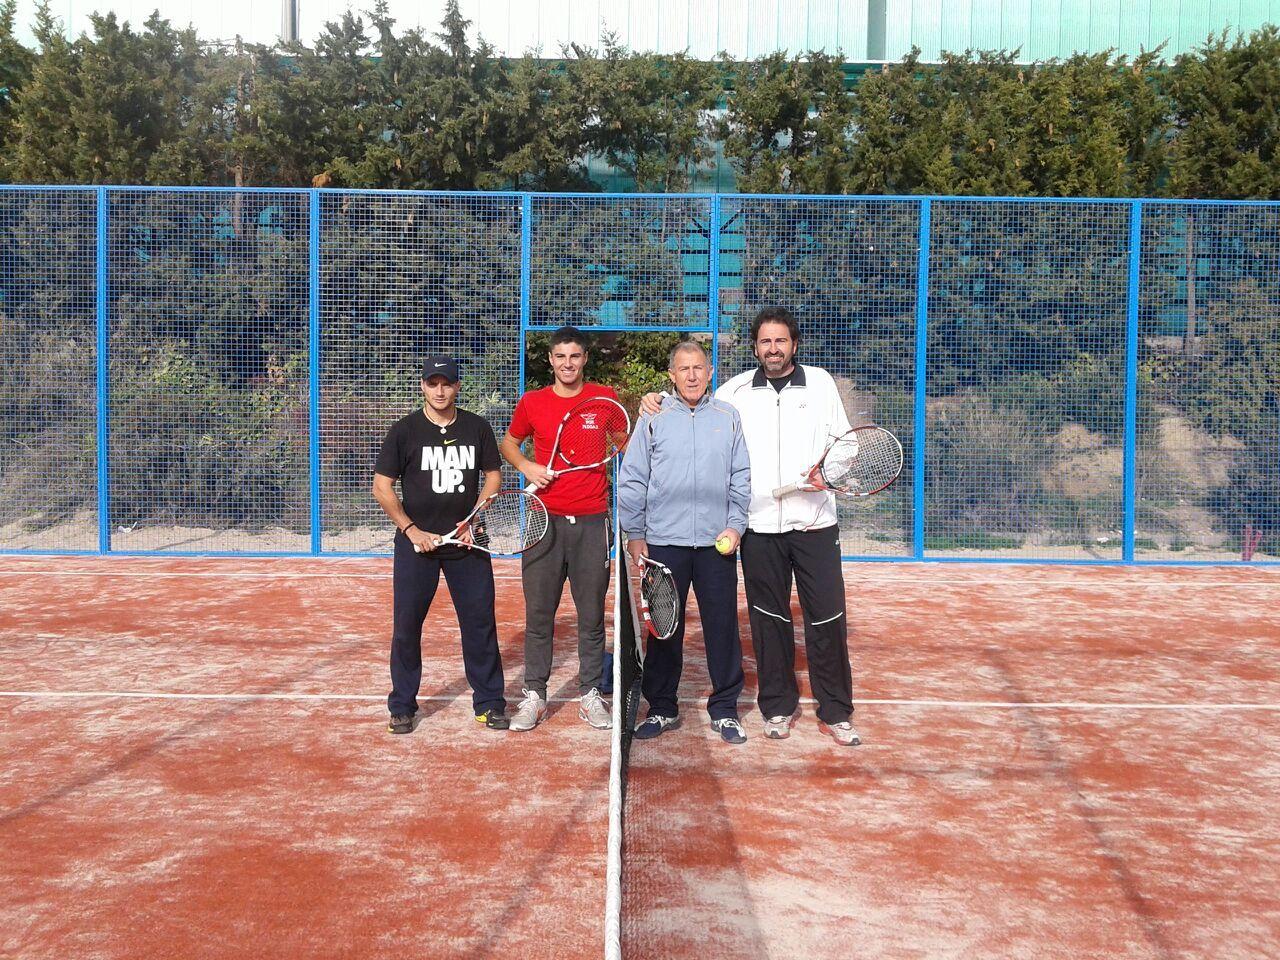 Tati Rascón, Juan Avendaño, Bruno Mardones y Curro Gómez se suman a la experiencia #Bquet.  http://bquet.com/